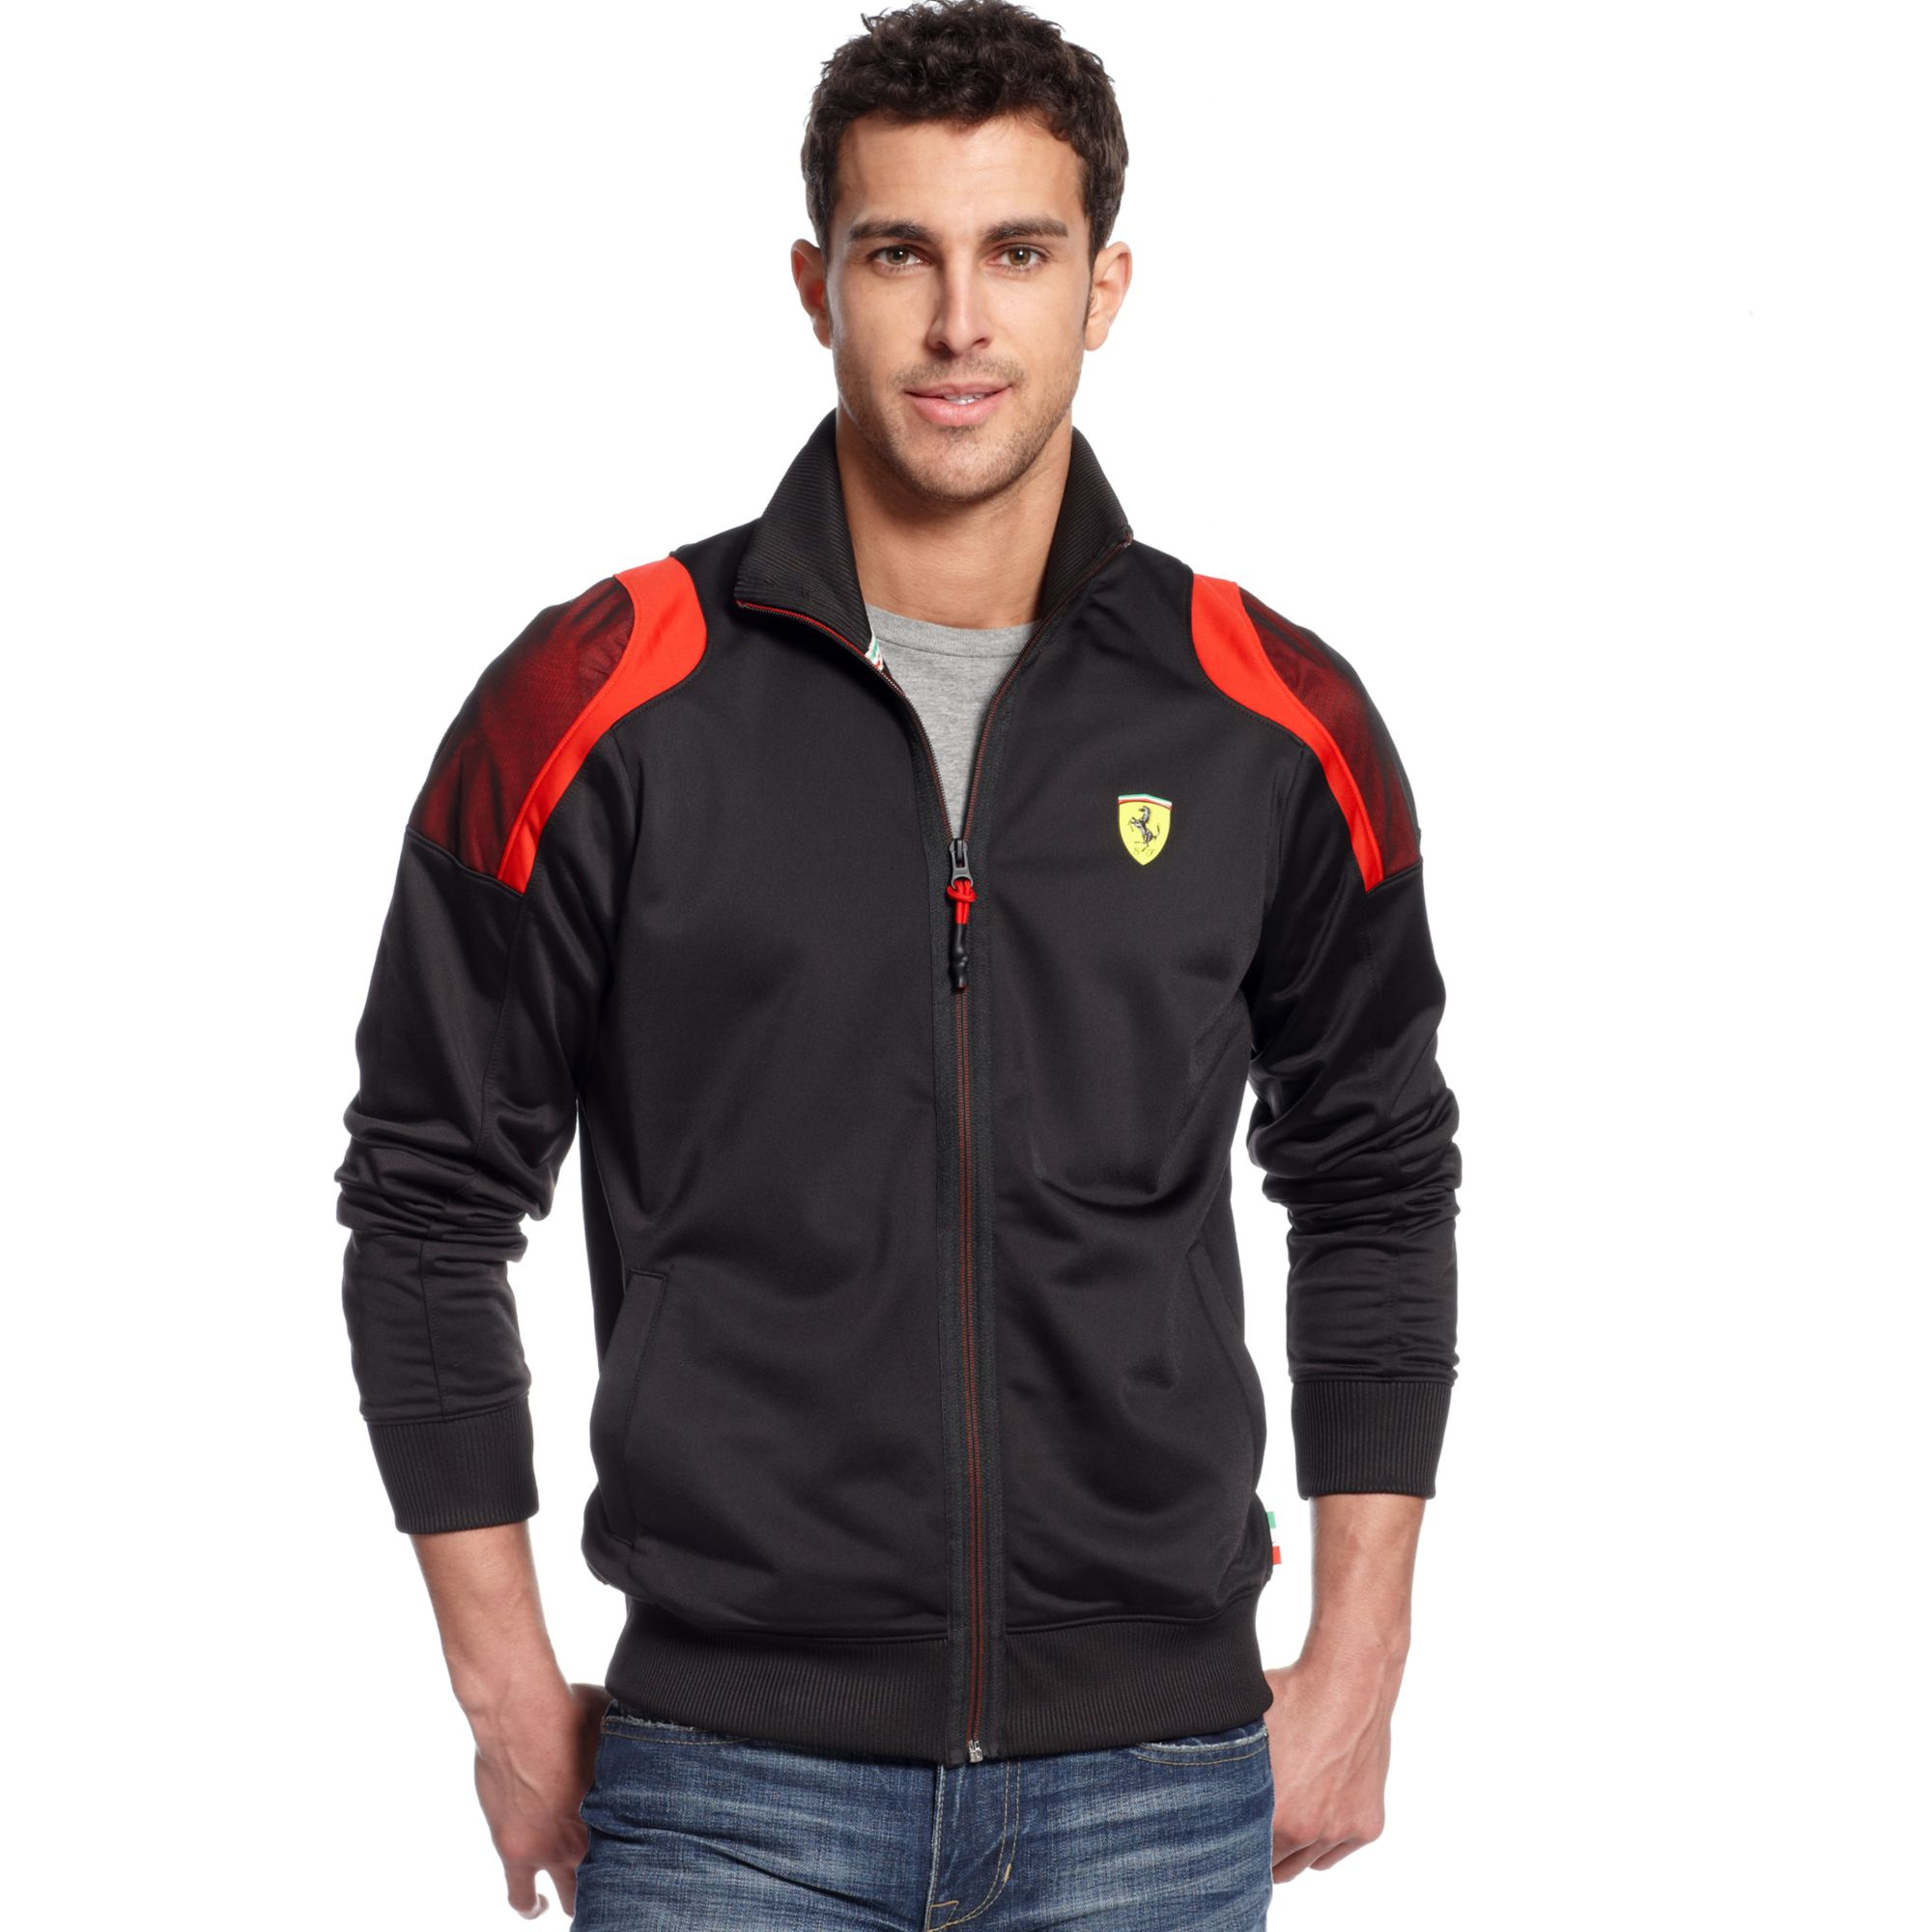 50\u20ac puma ferrari jackets for men , Achat